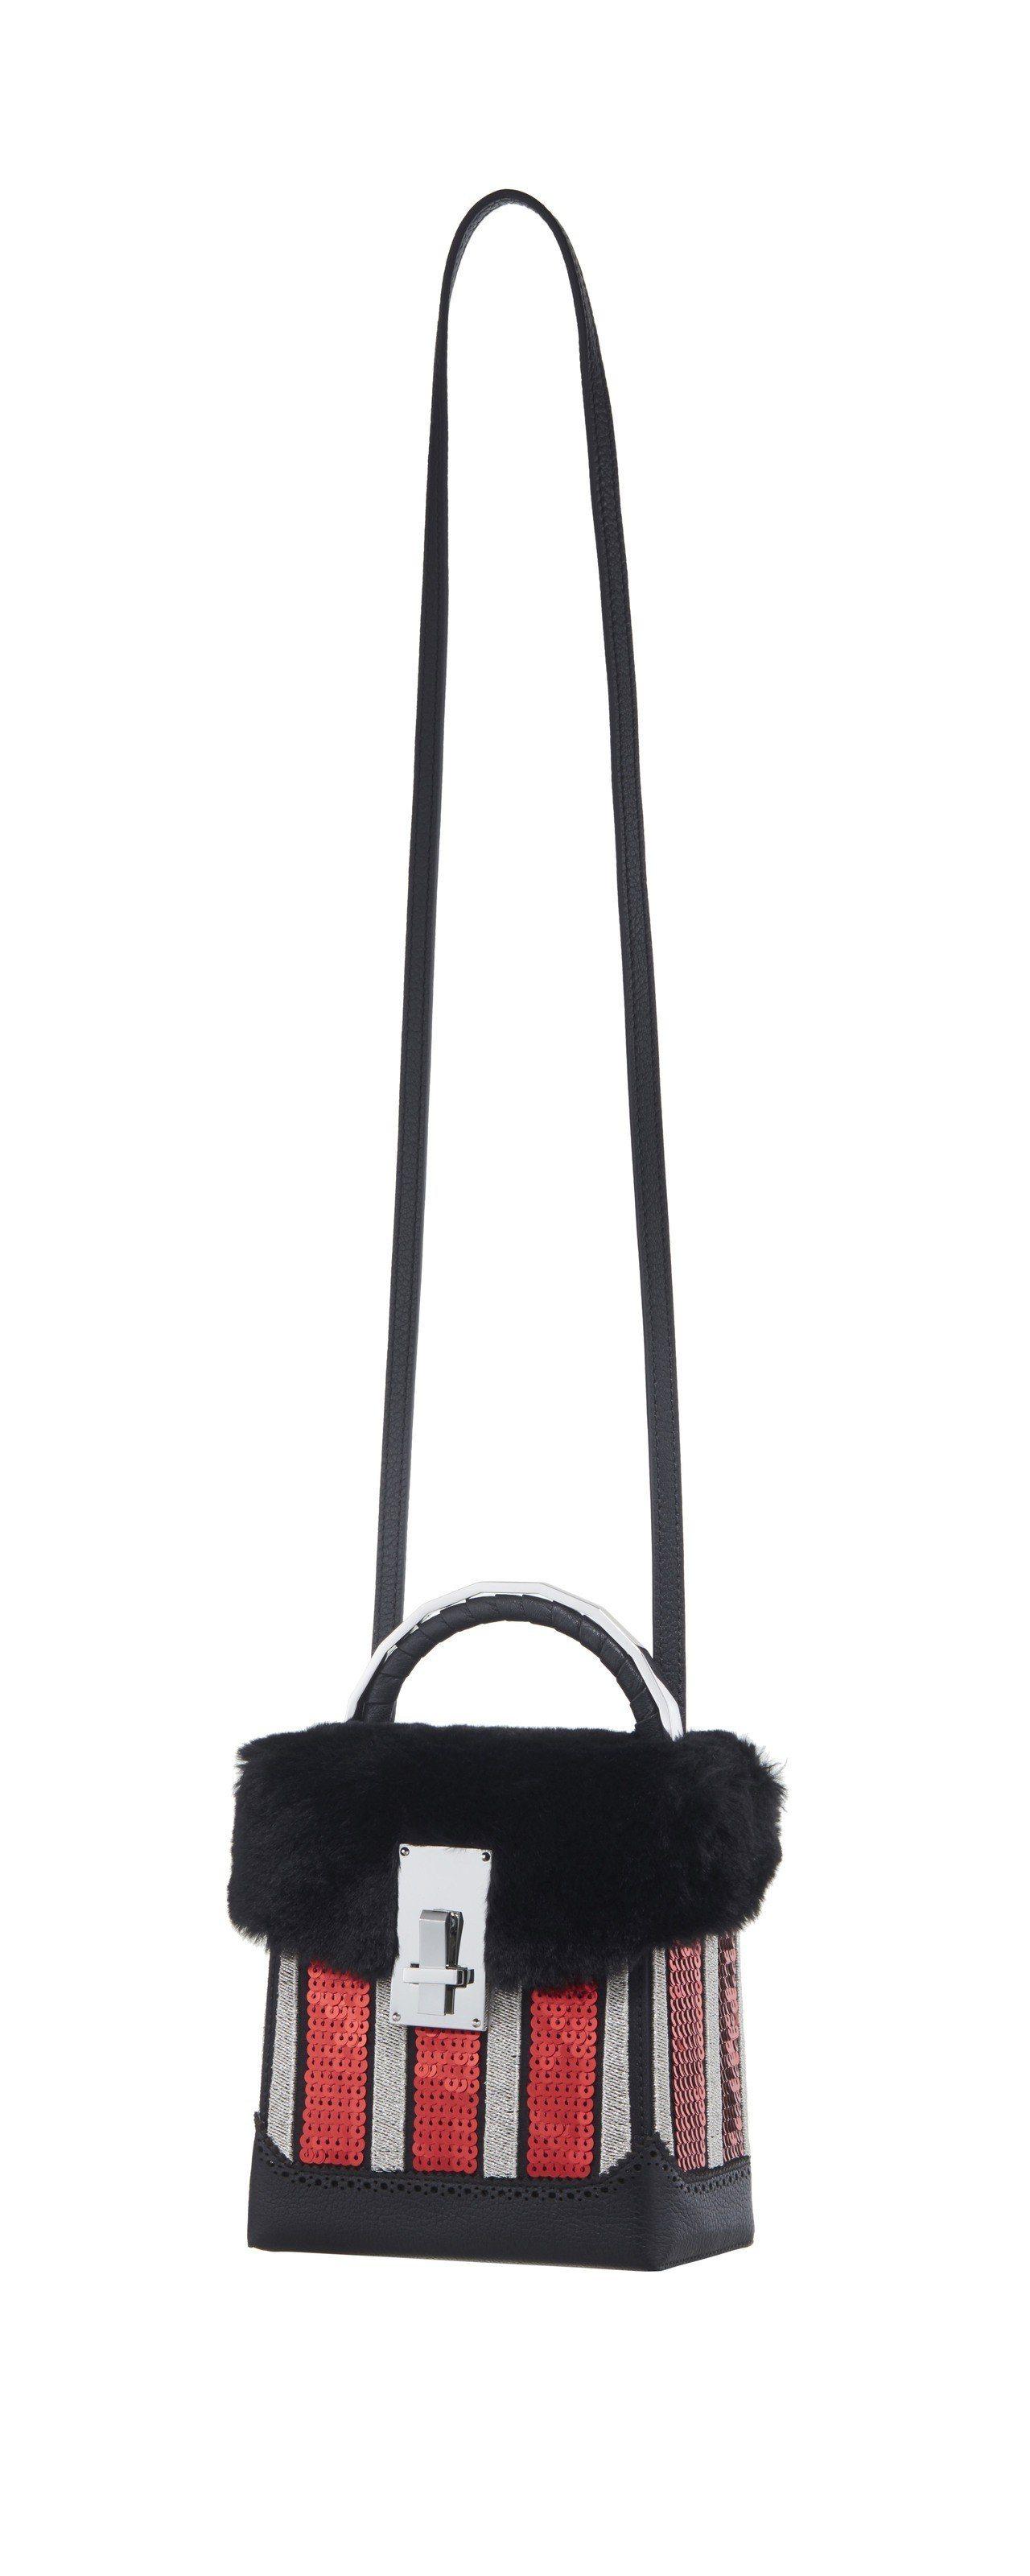 The Volon黑紅銀條紋拚色箱型手提包,售價34,080元。圖/onefif...